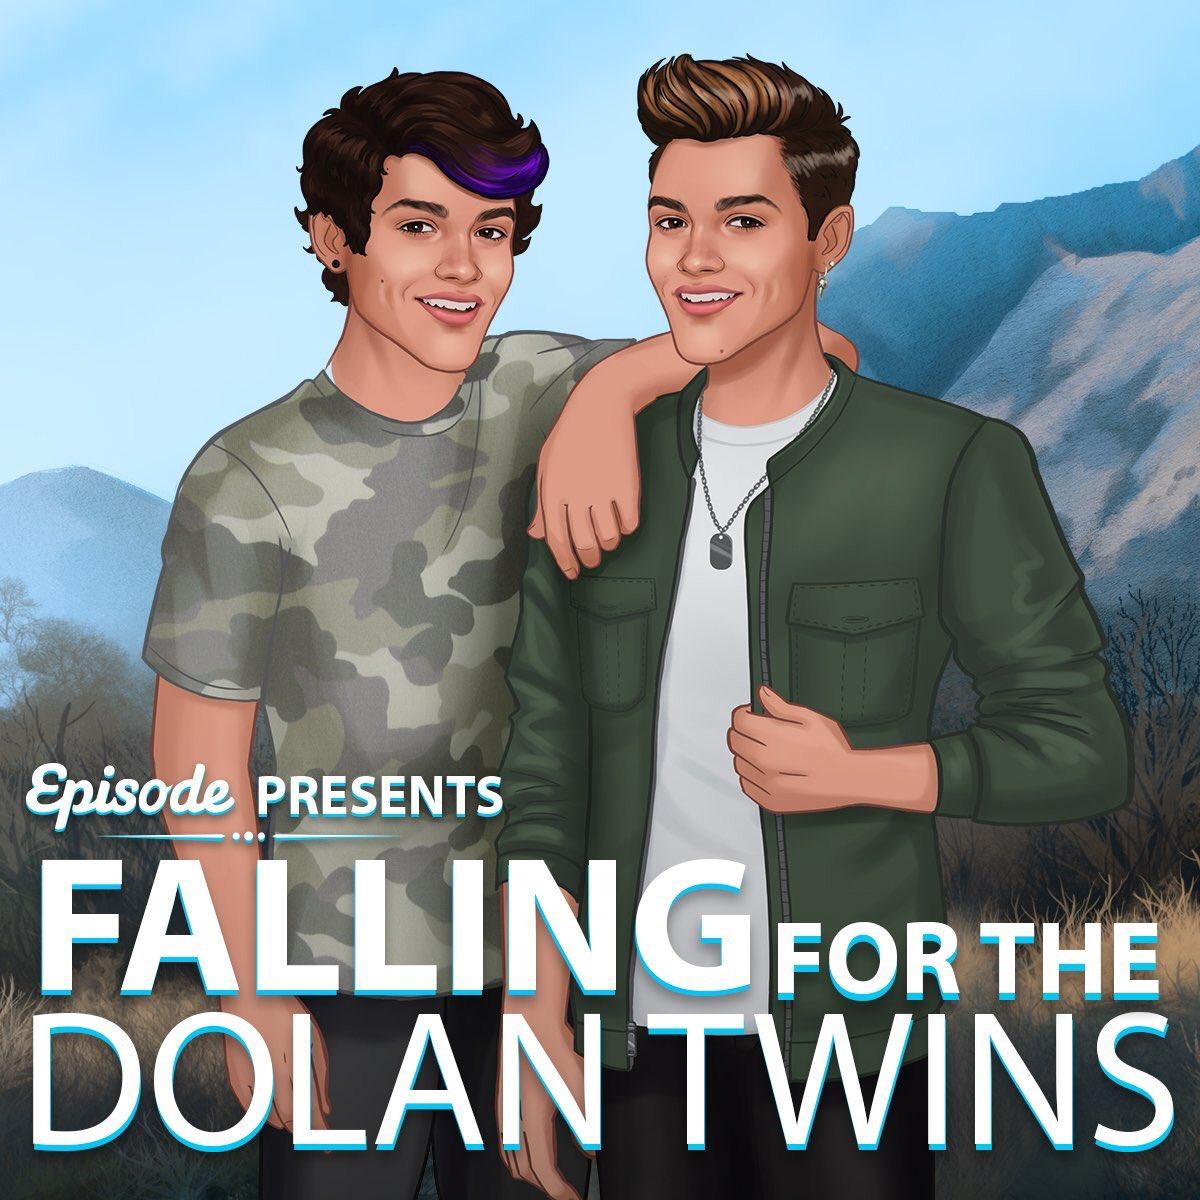 ♛ Dolan Twins ♛ on Twitter: